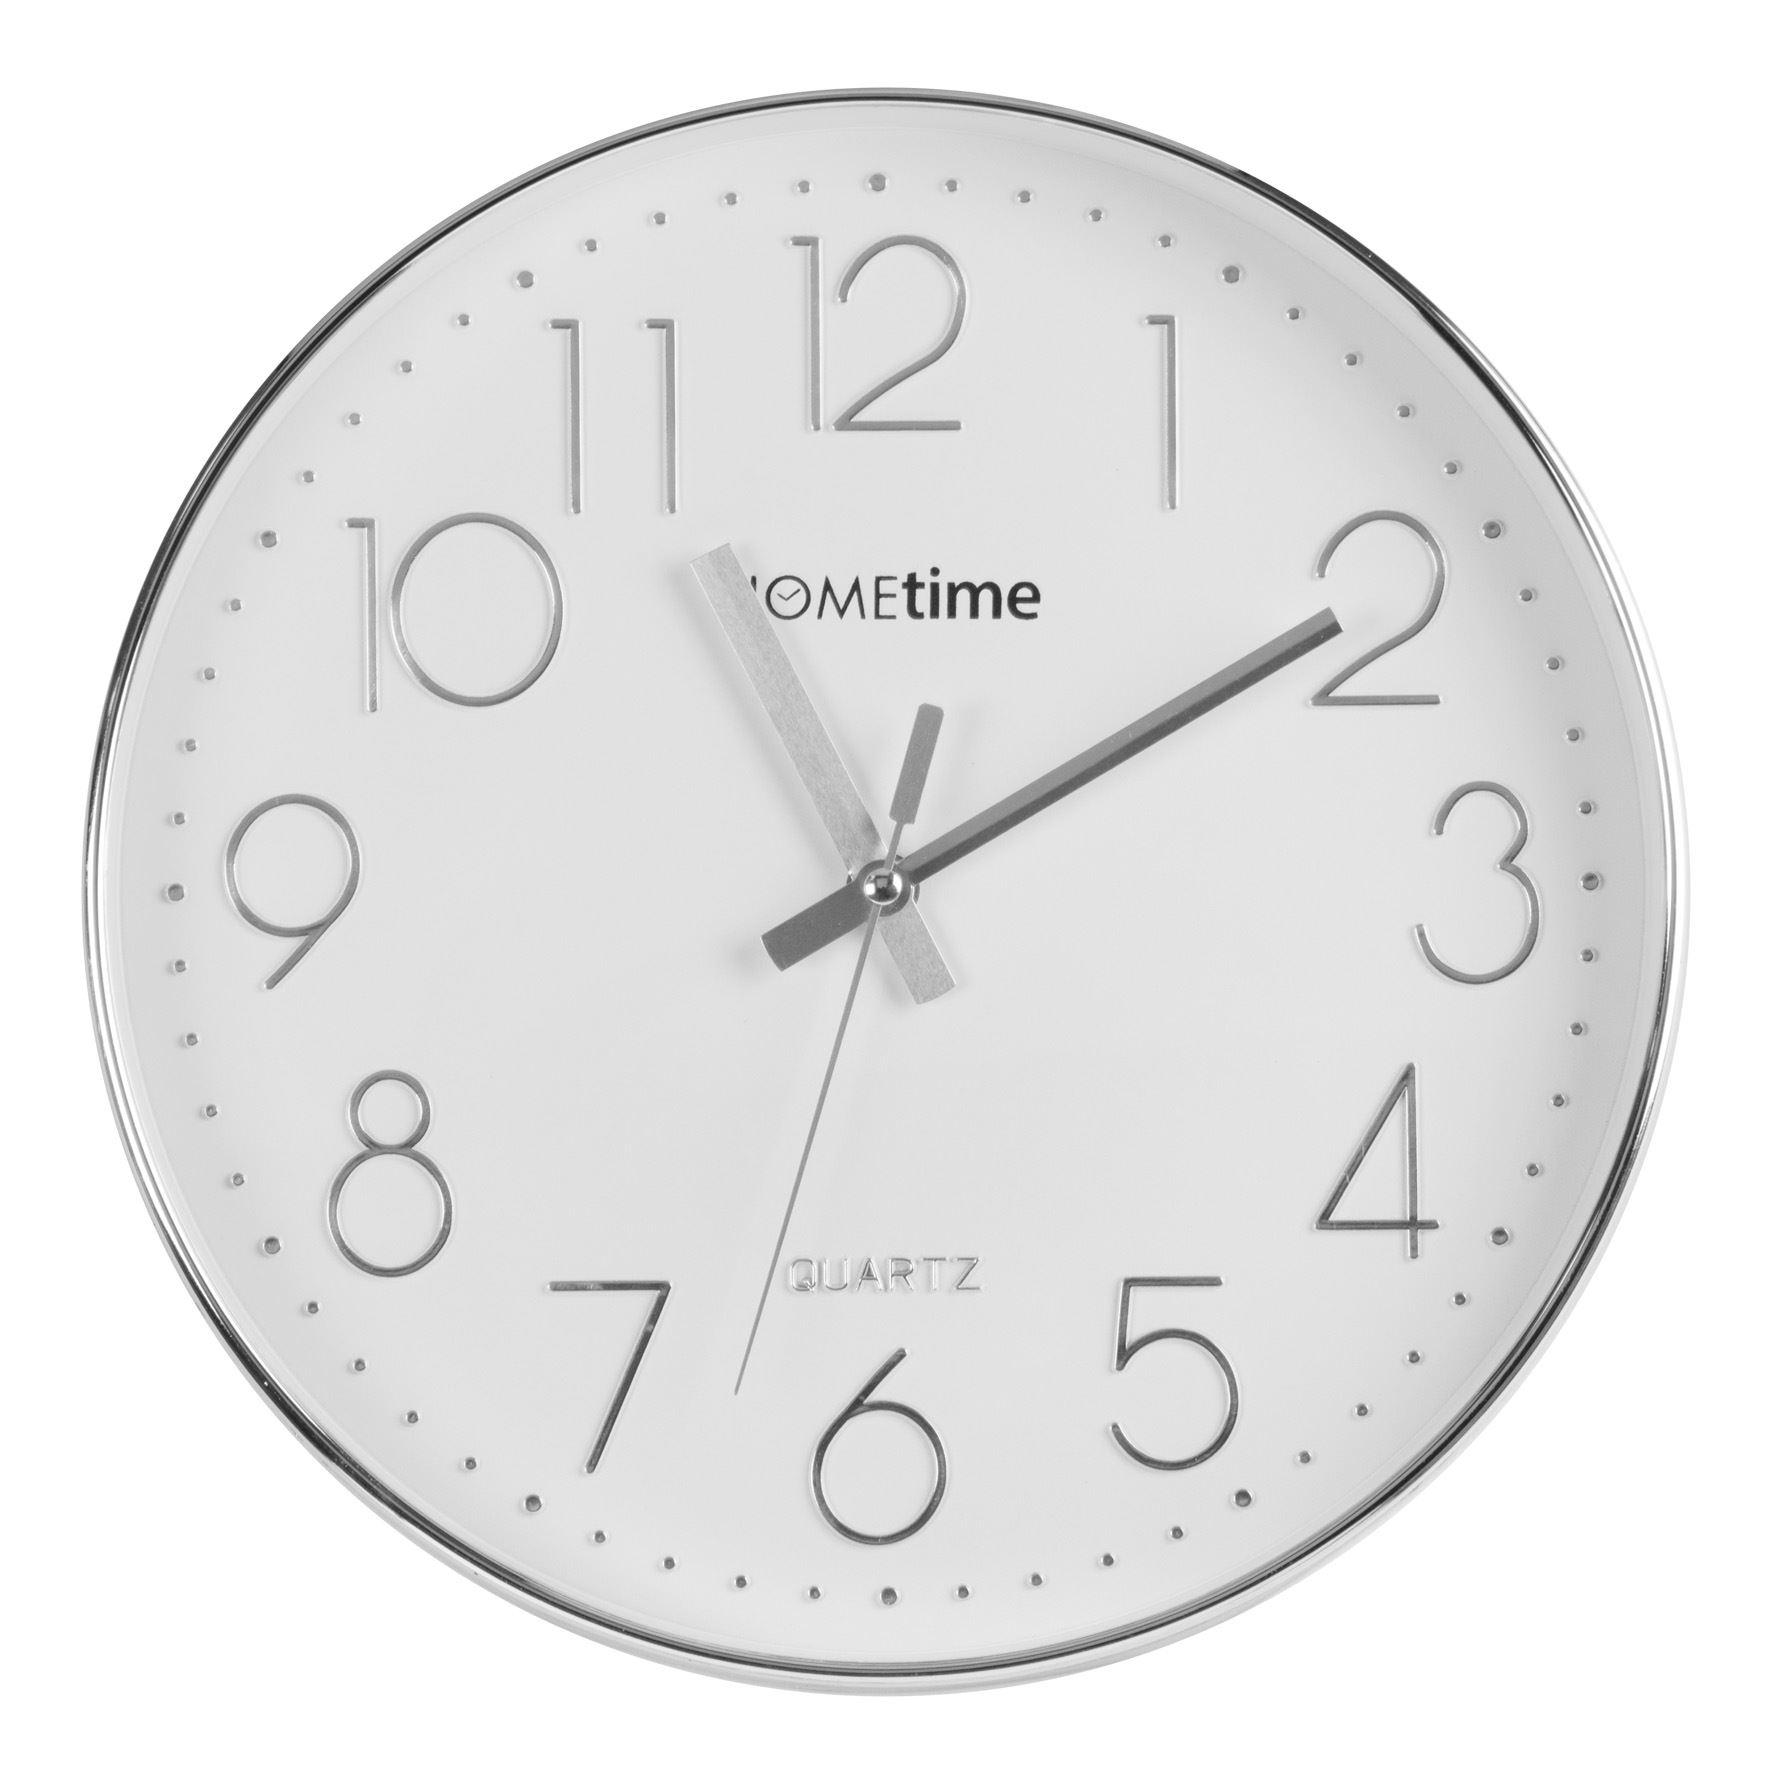 Hometime Round Plastic Living Room Wall Clock Chrome Finish  (30cm)